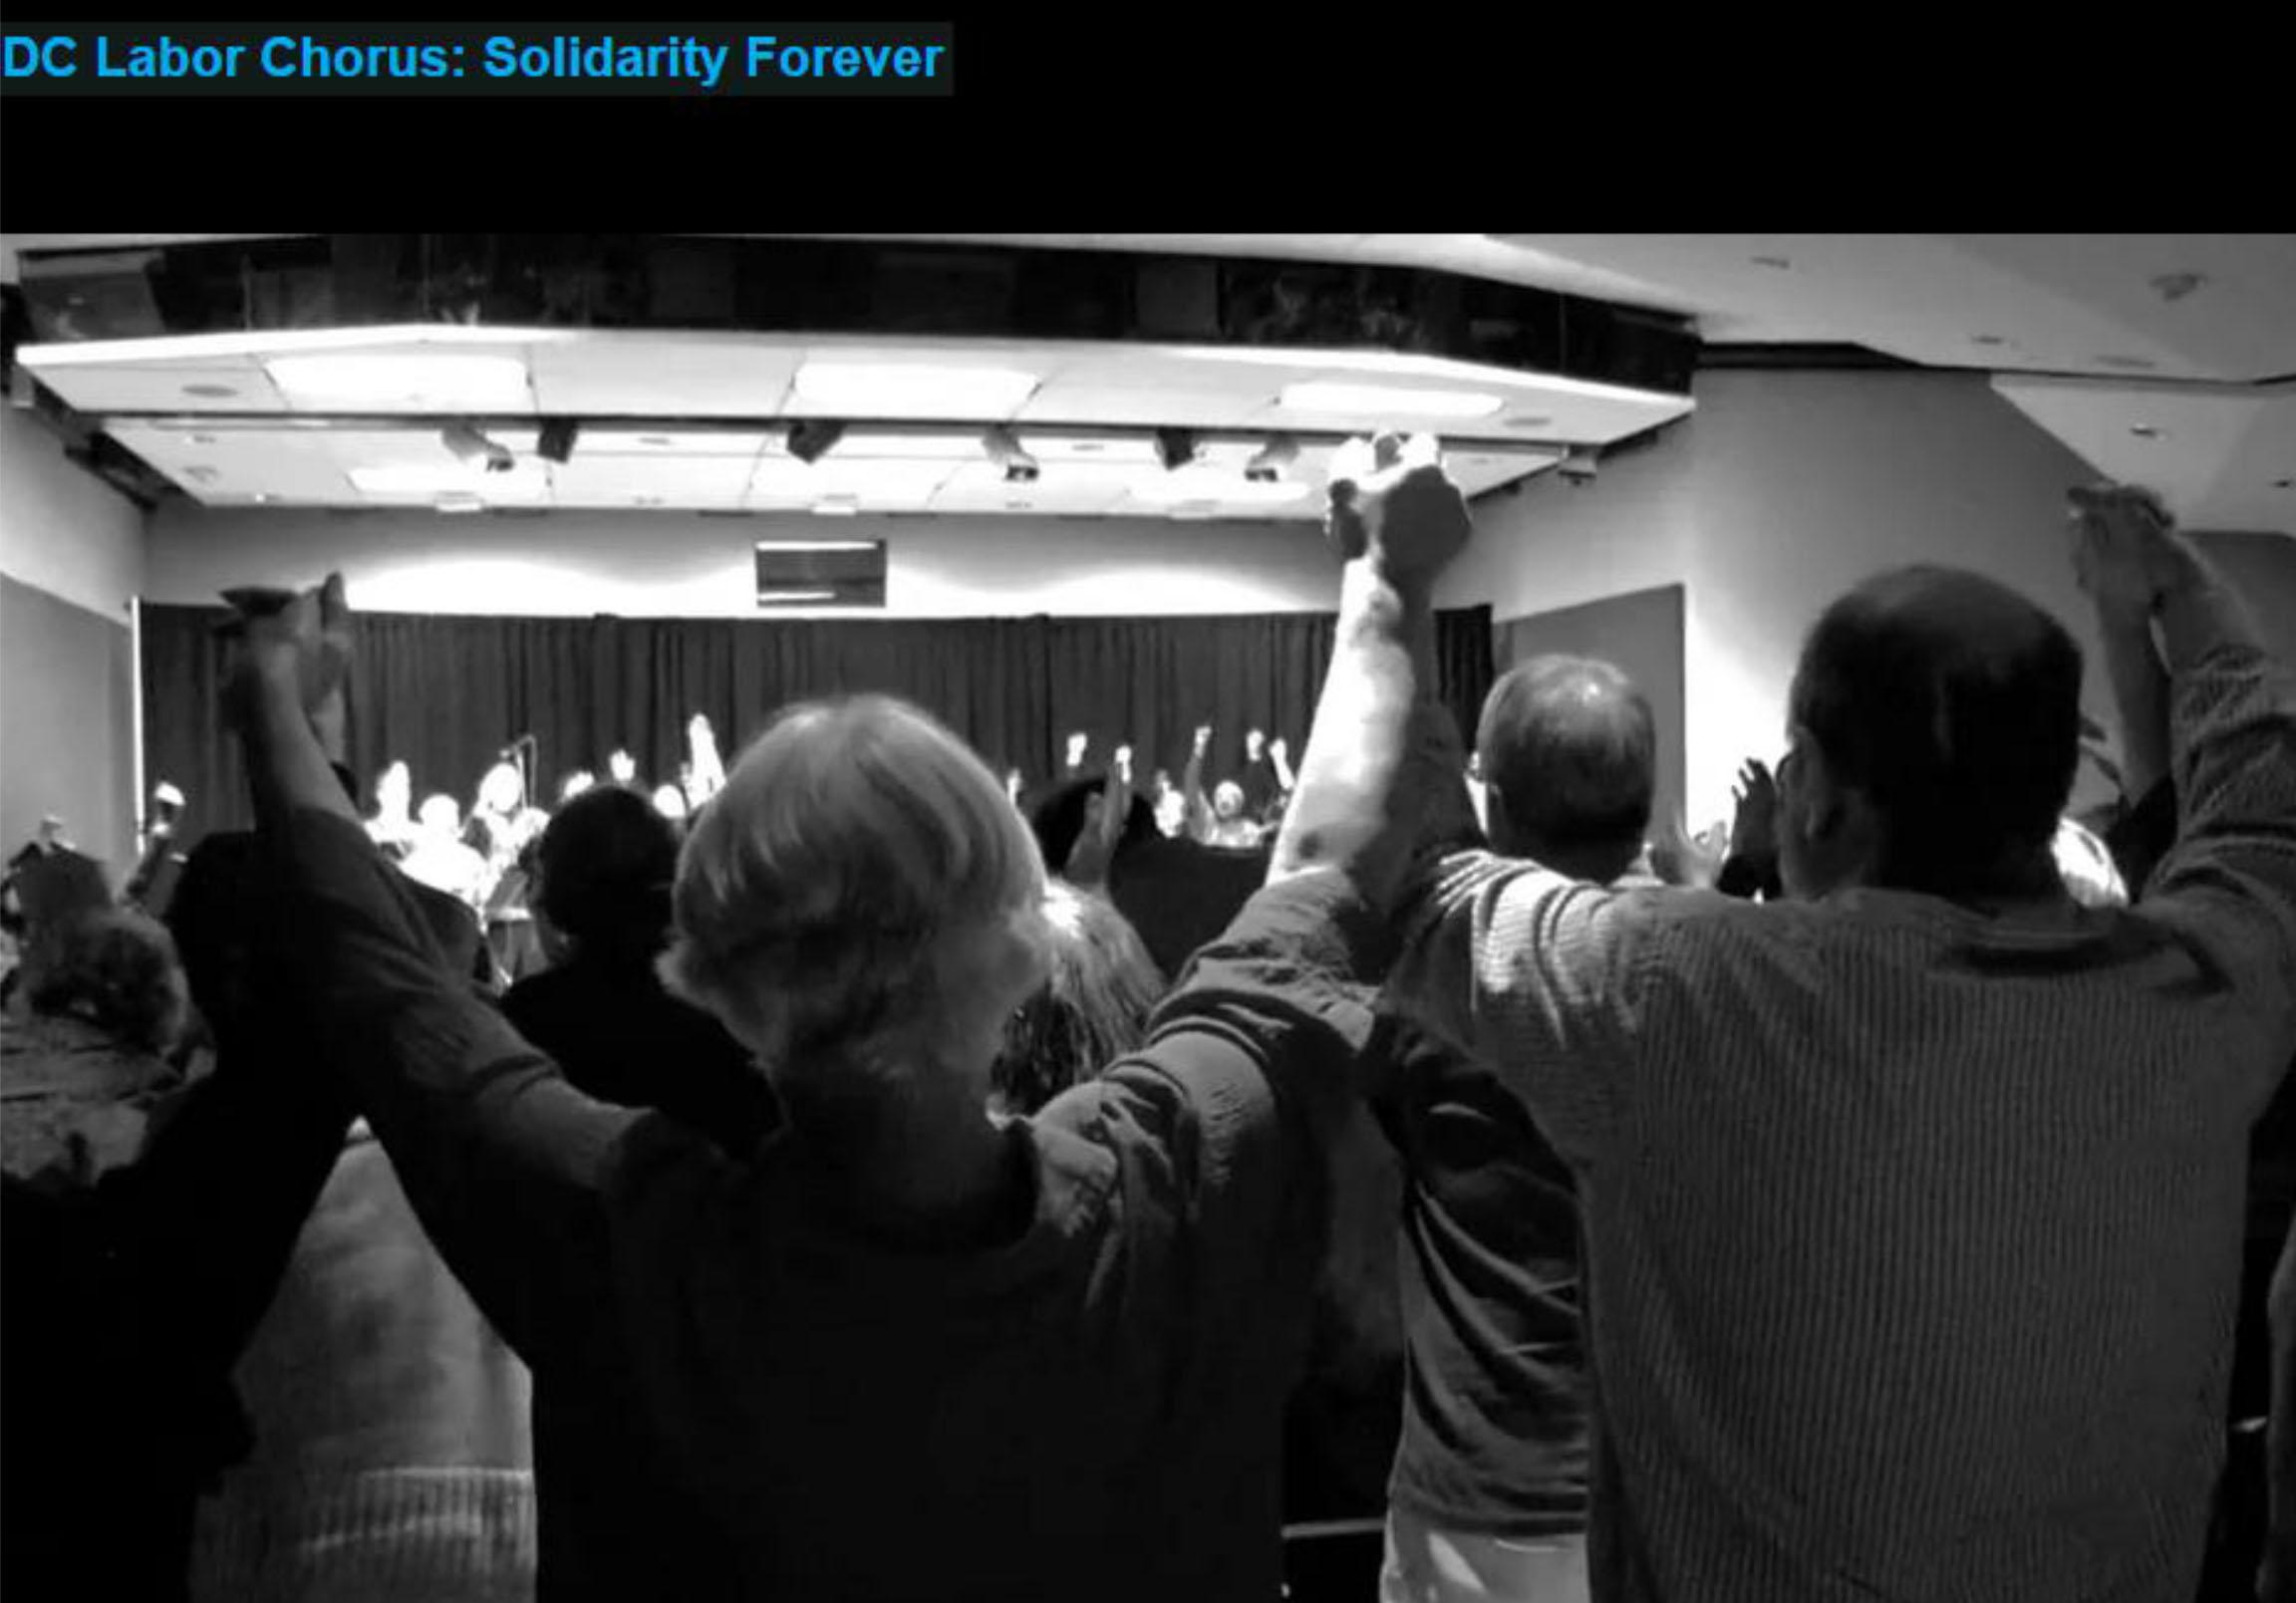 DCLC SolidarityForever